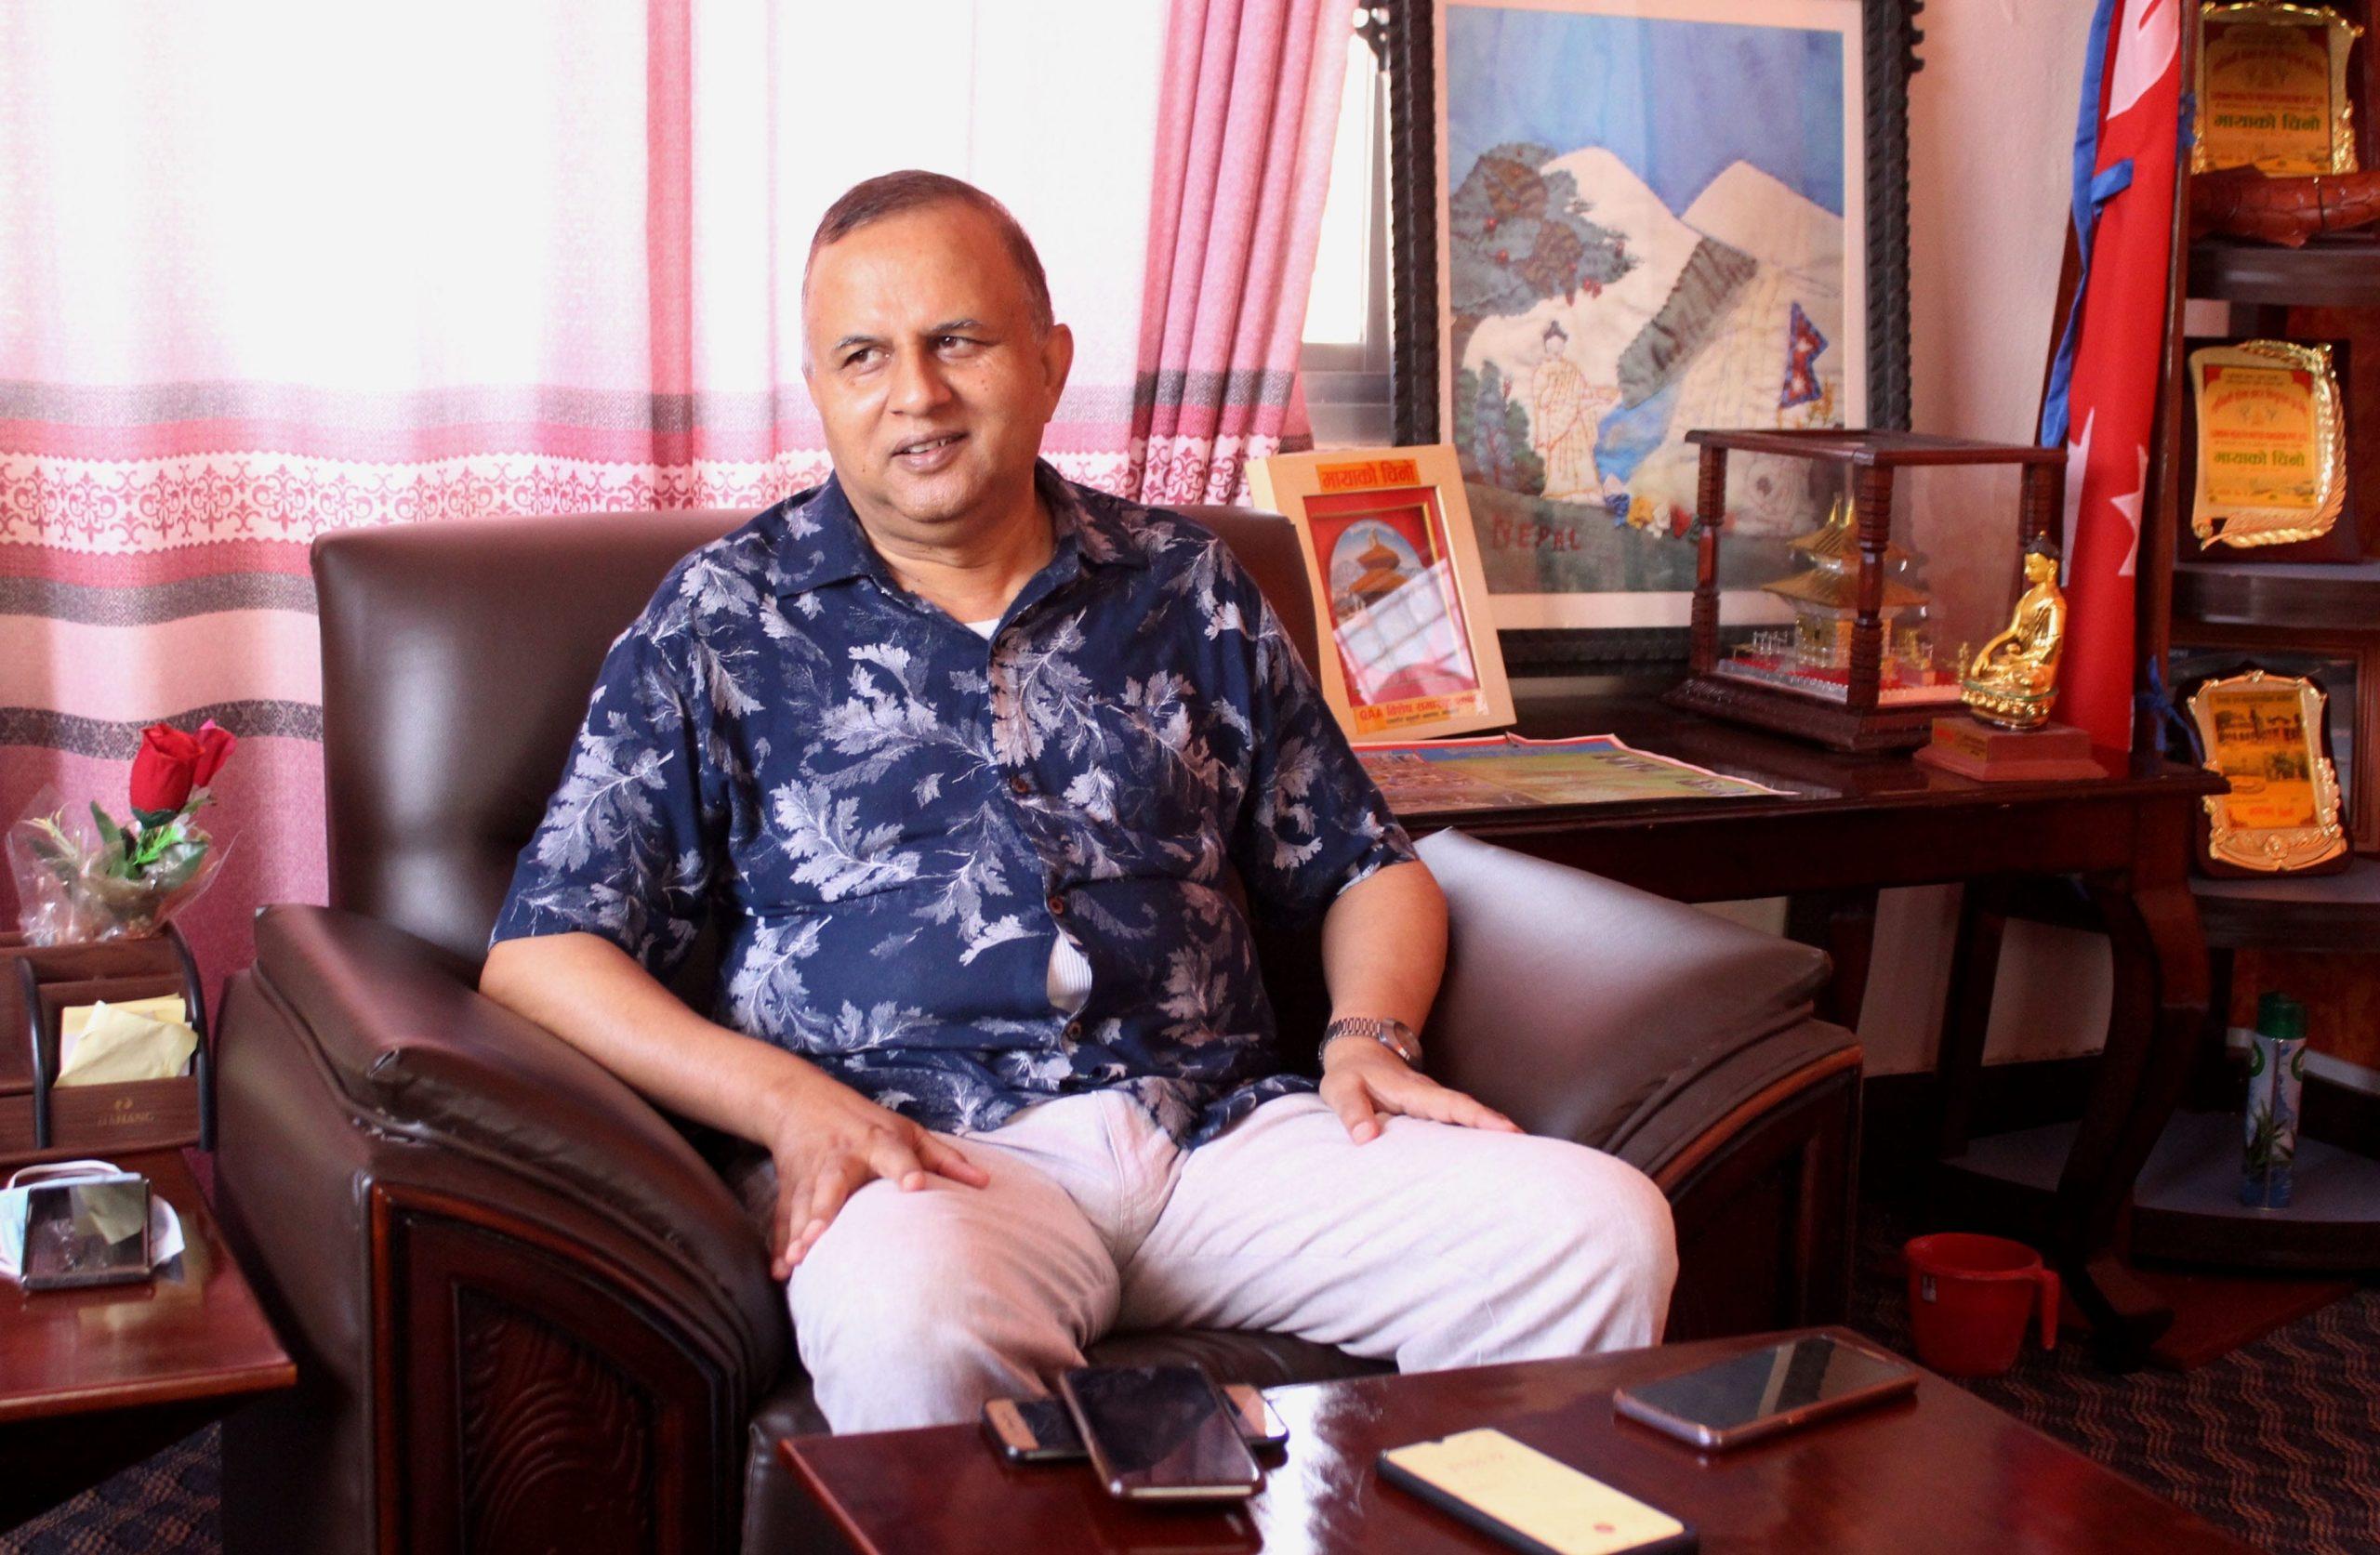 शंकर पोखरेलसहित चार जनाविरुद्ध अपहरण तथा शरीर बन्धक सम्बन्धी उजूरी